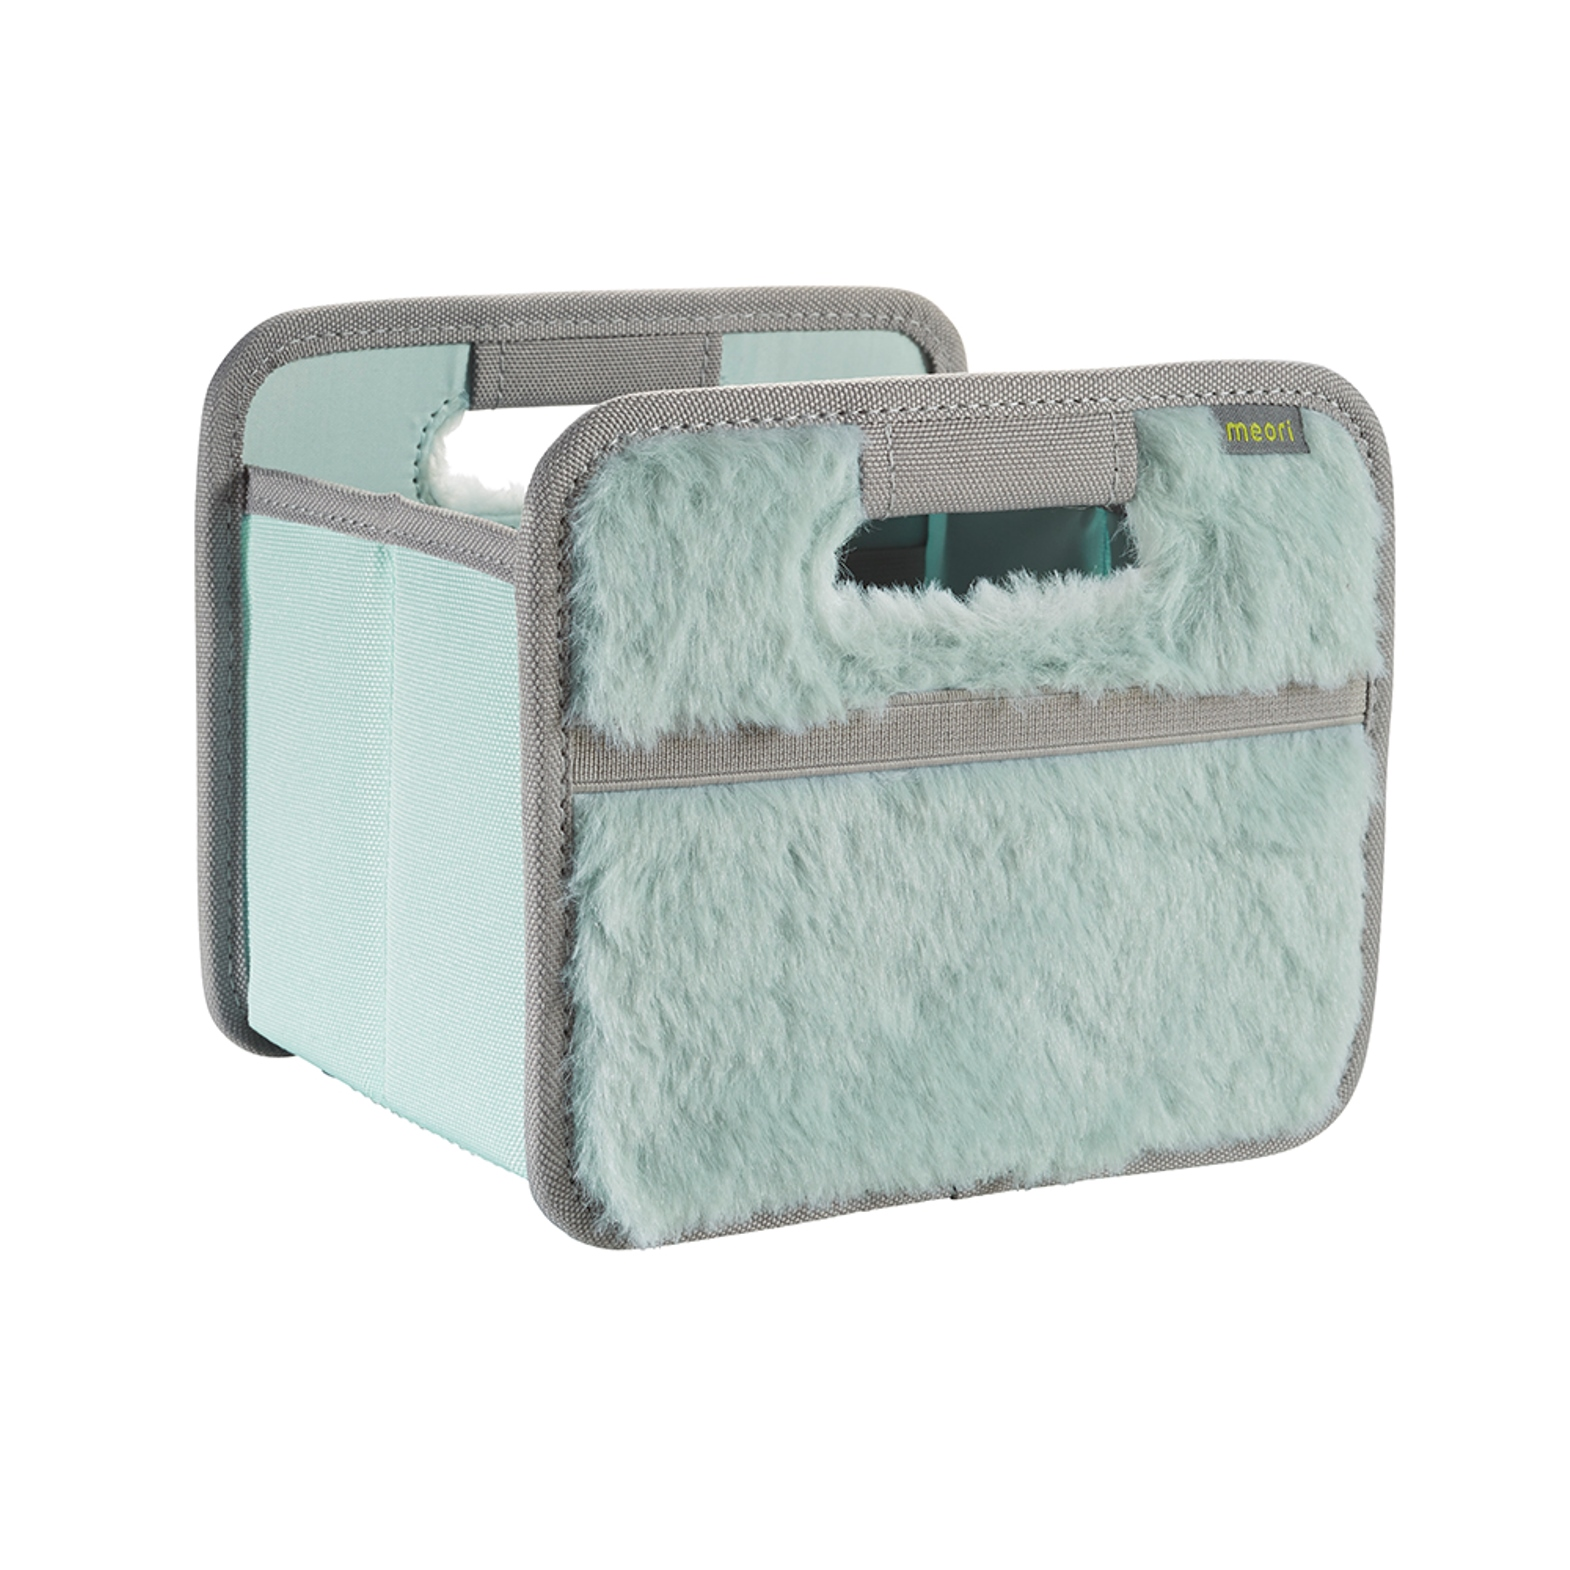 Онлайн каталог PROMENU: Складной короб для хранения мини Meori, 16,5x14x12,5 см, ментоловый с мехом Meori A100665